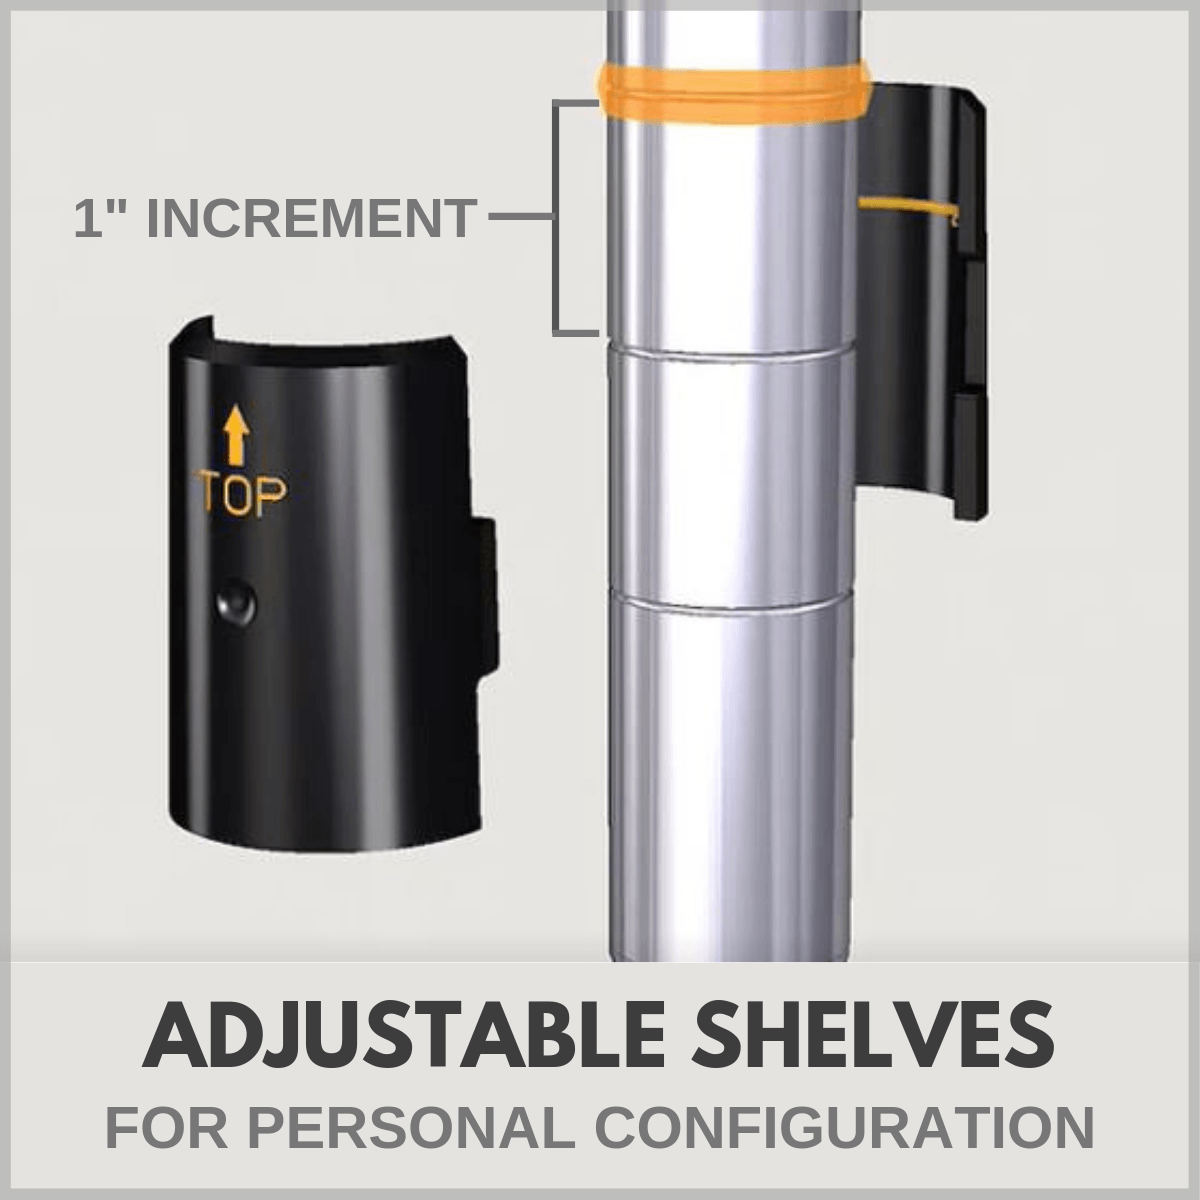 "Adjustable shelves in 1"" increments"